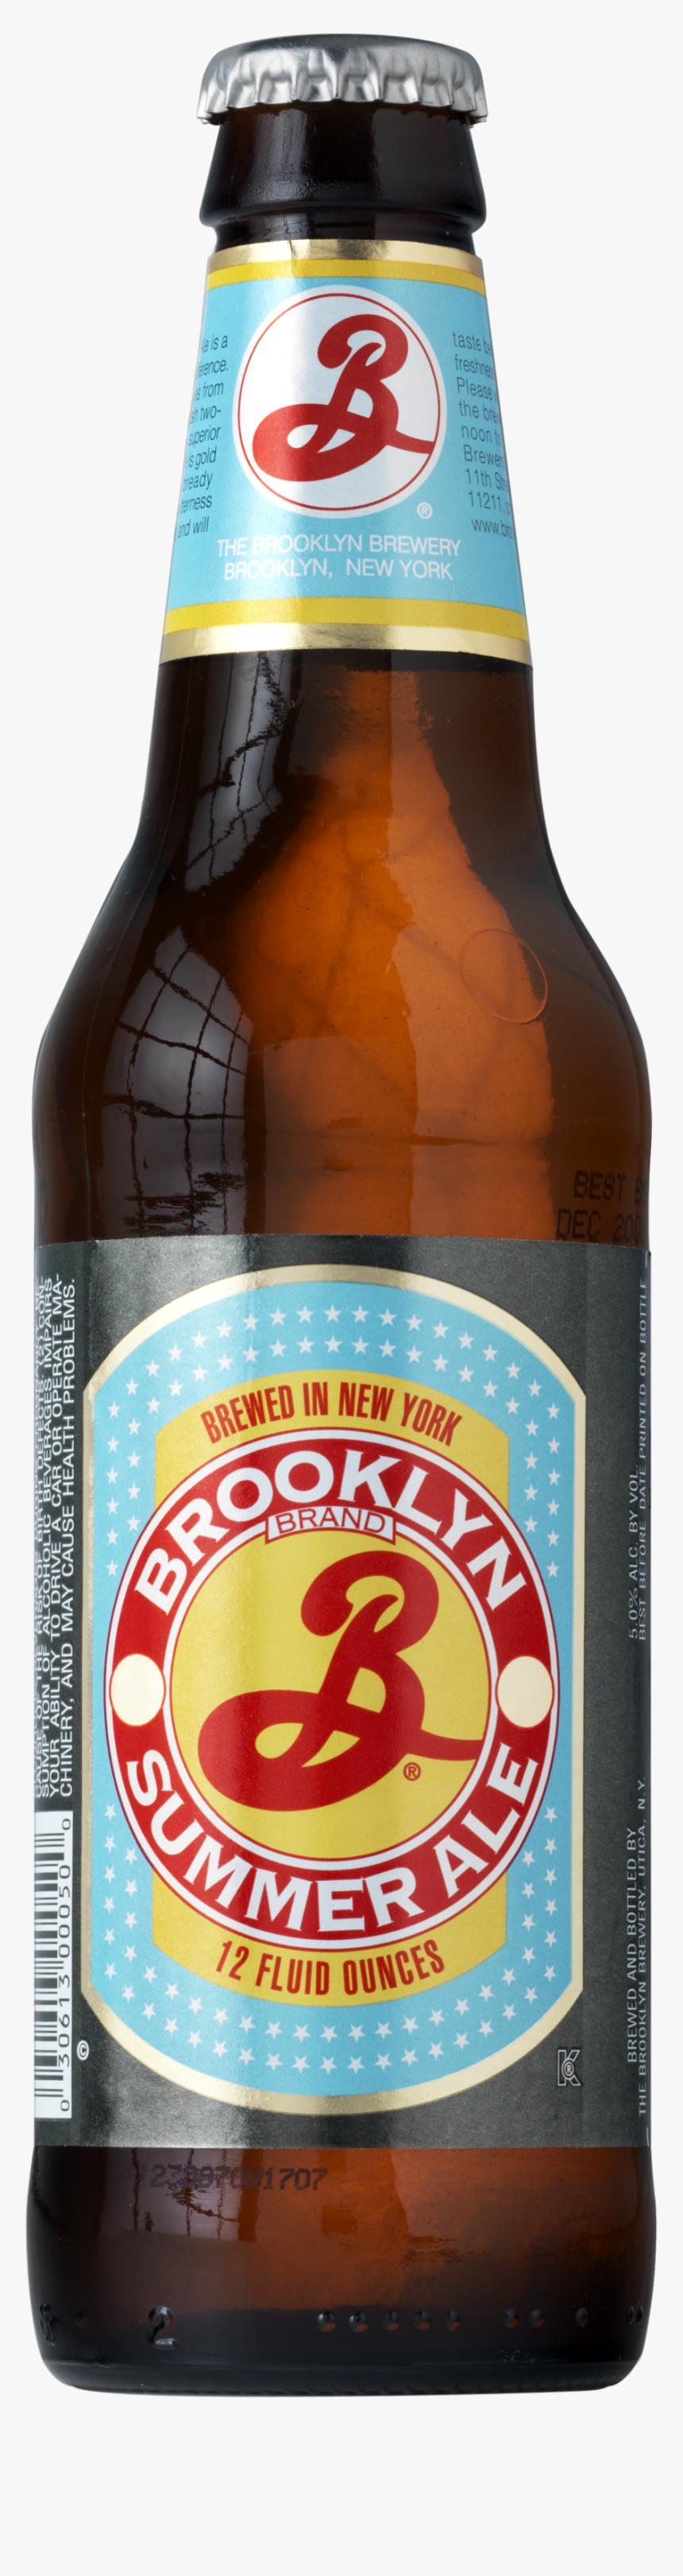 Brooklyn Summer Ale Bottle, HD Png Download, Free Download